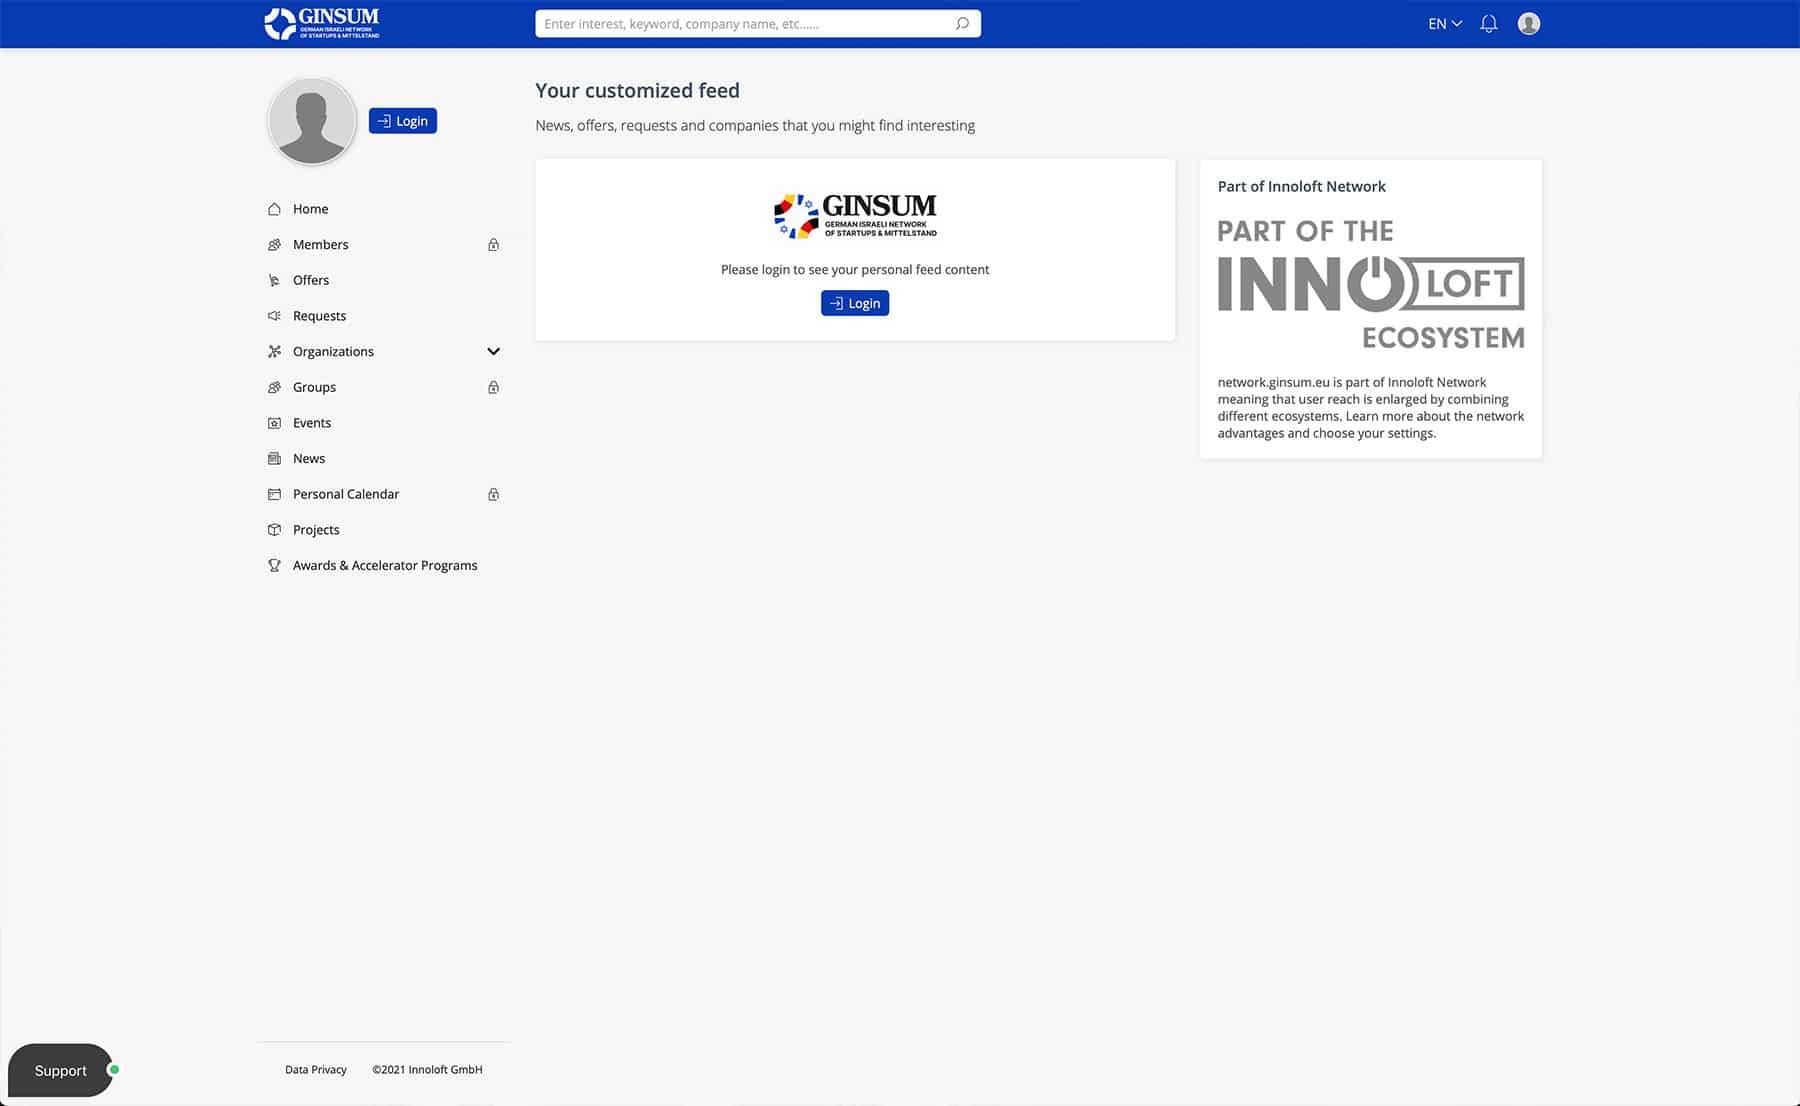 GINSUM Community Innoloft